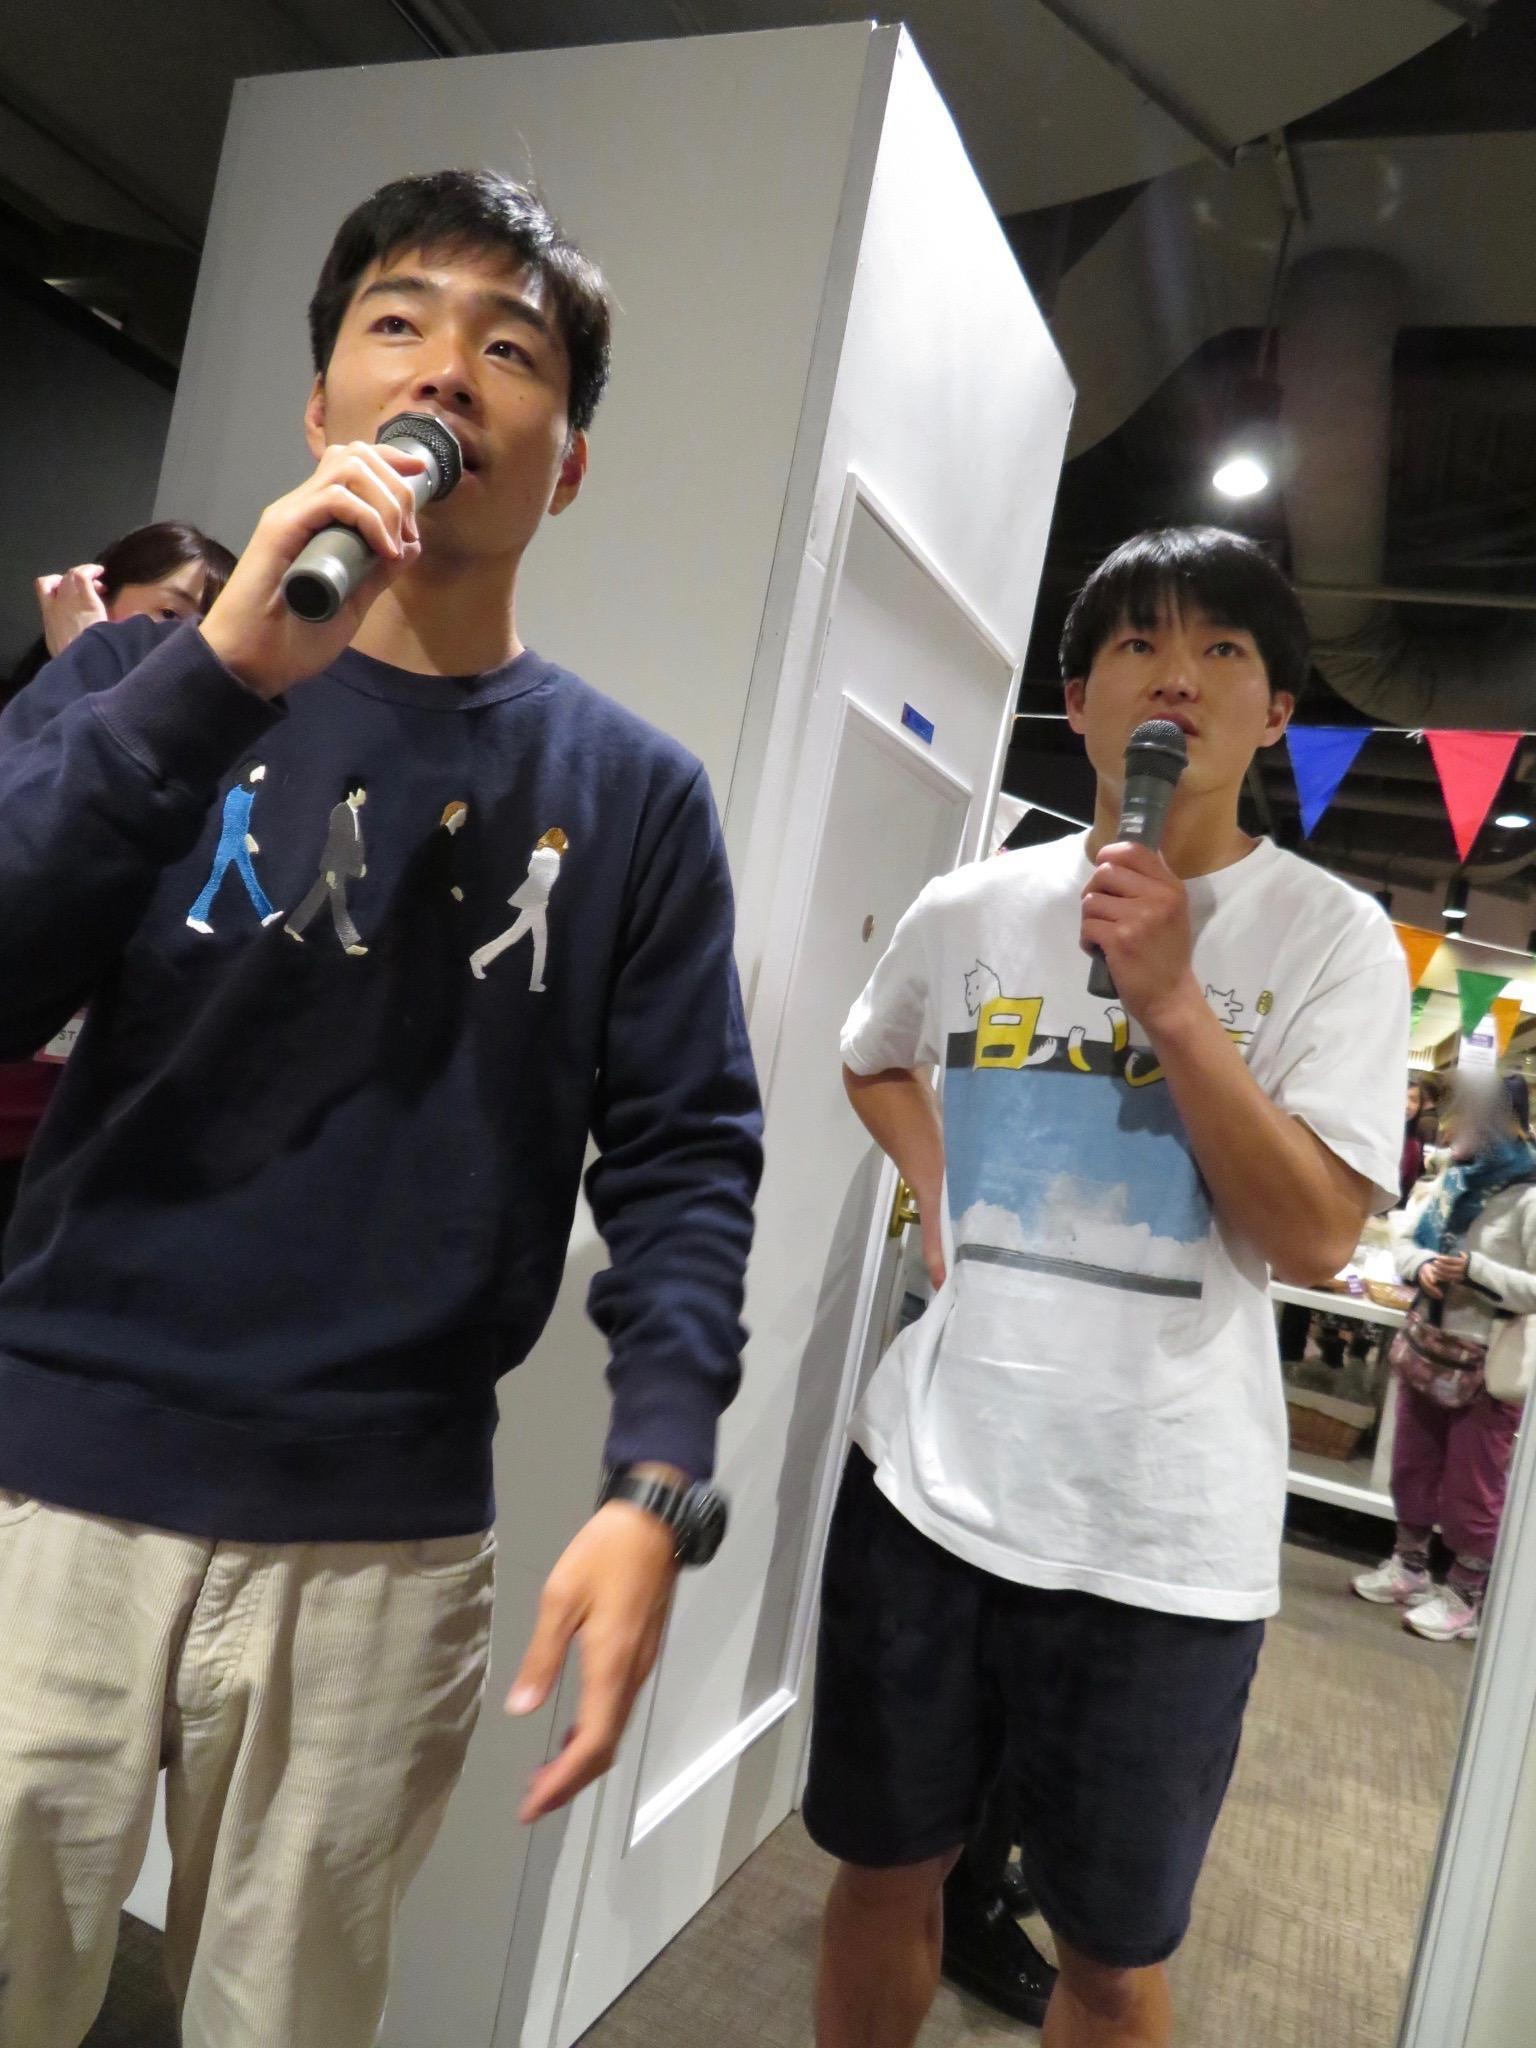 http://news.yoshimoto.co.jp/20190201194049-961e0817adbacad326b9d0d3a67eaef07339b801.jpeg